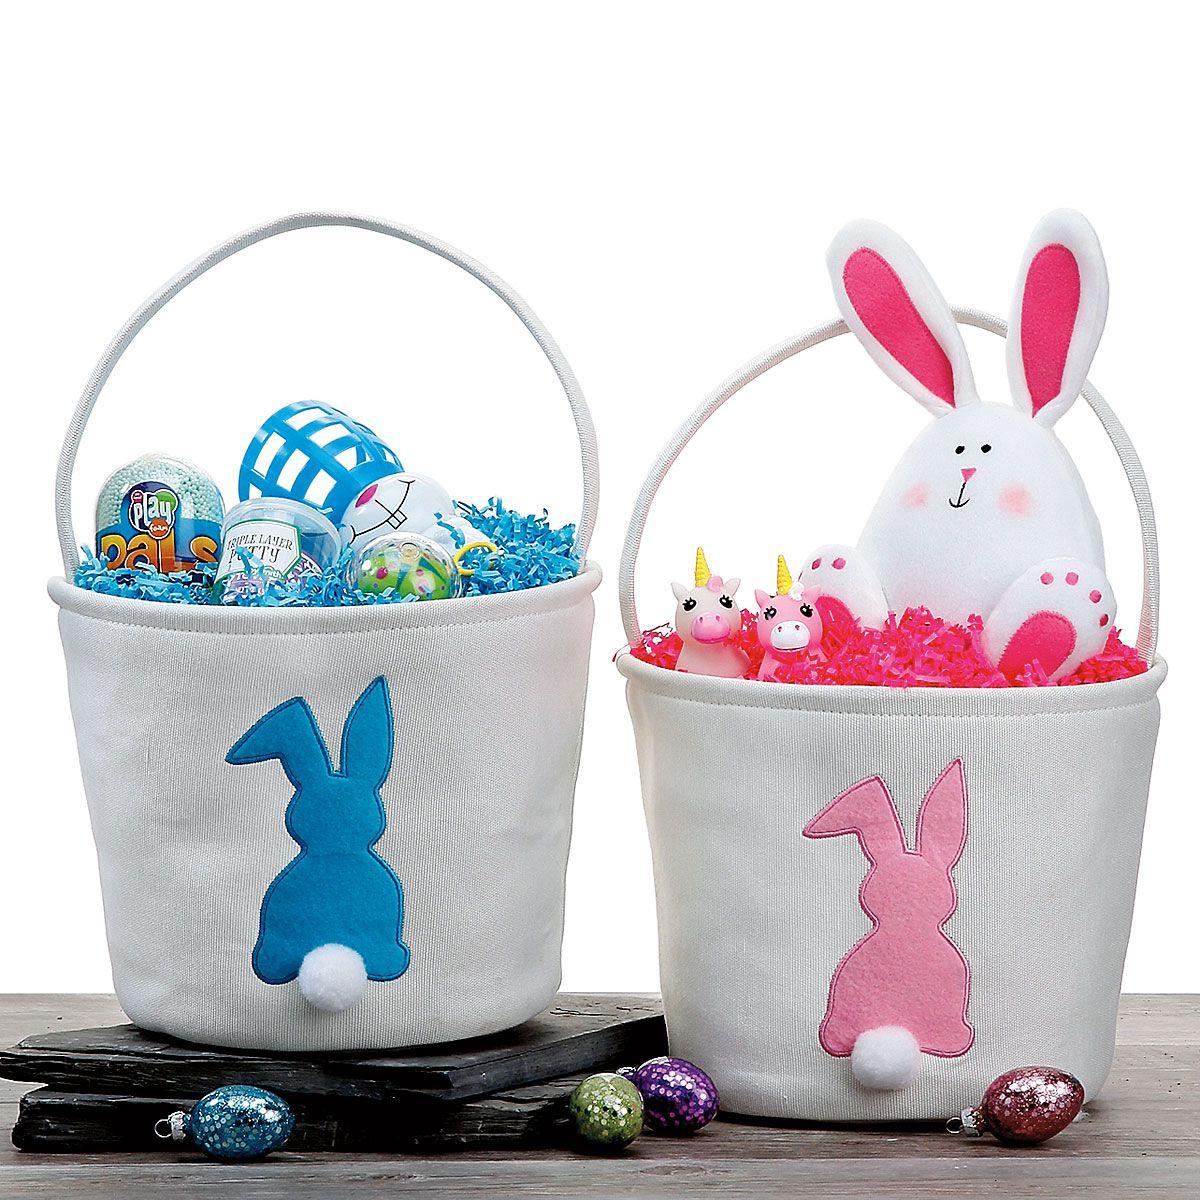 Fabric Bunny Baskets